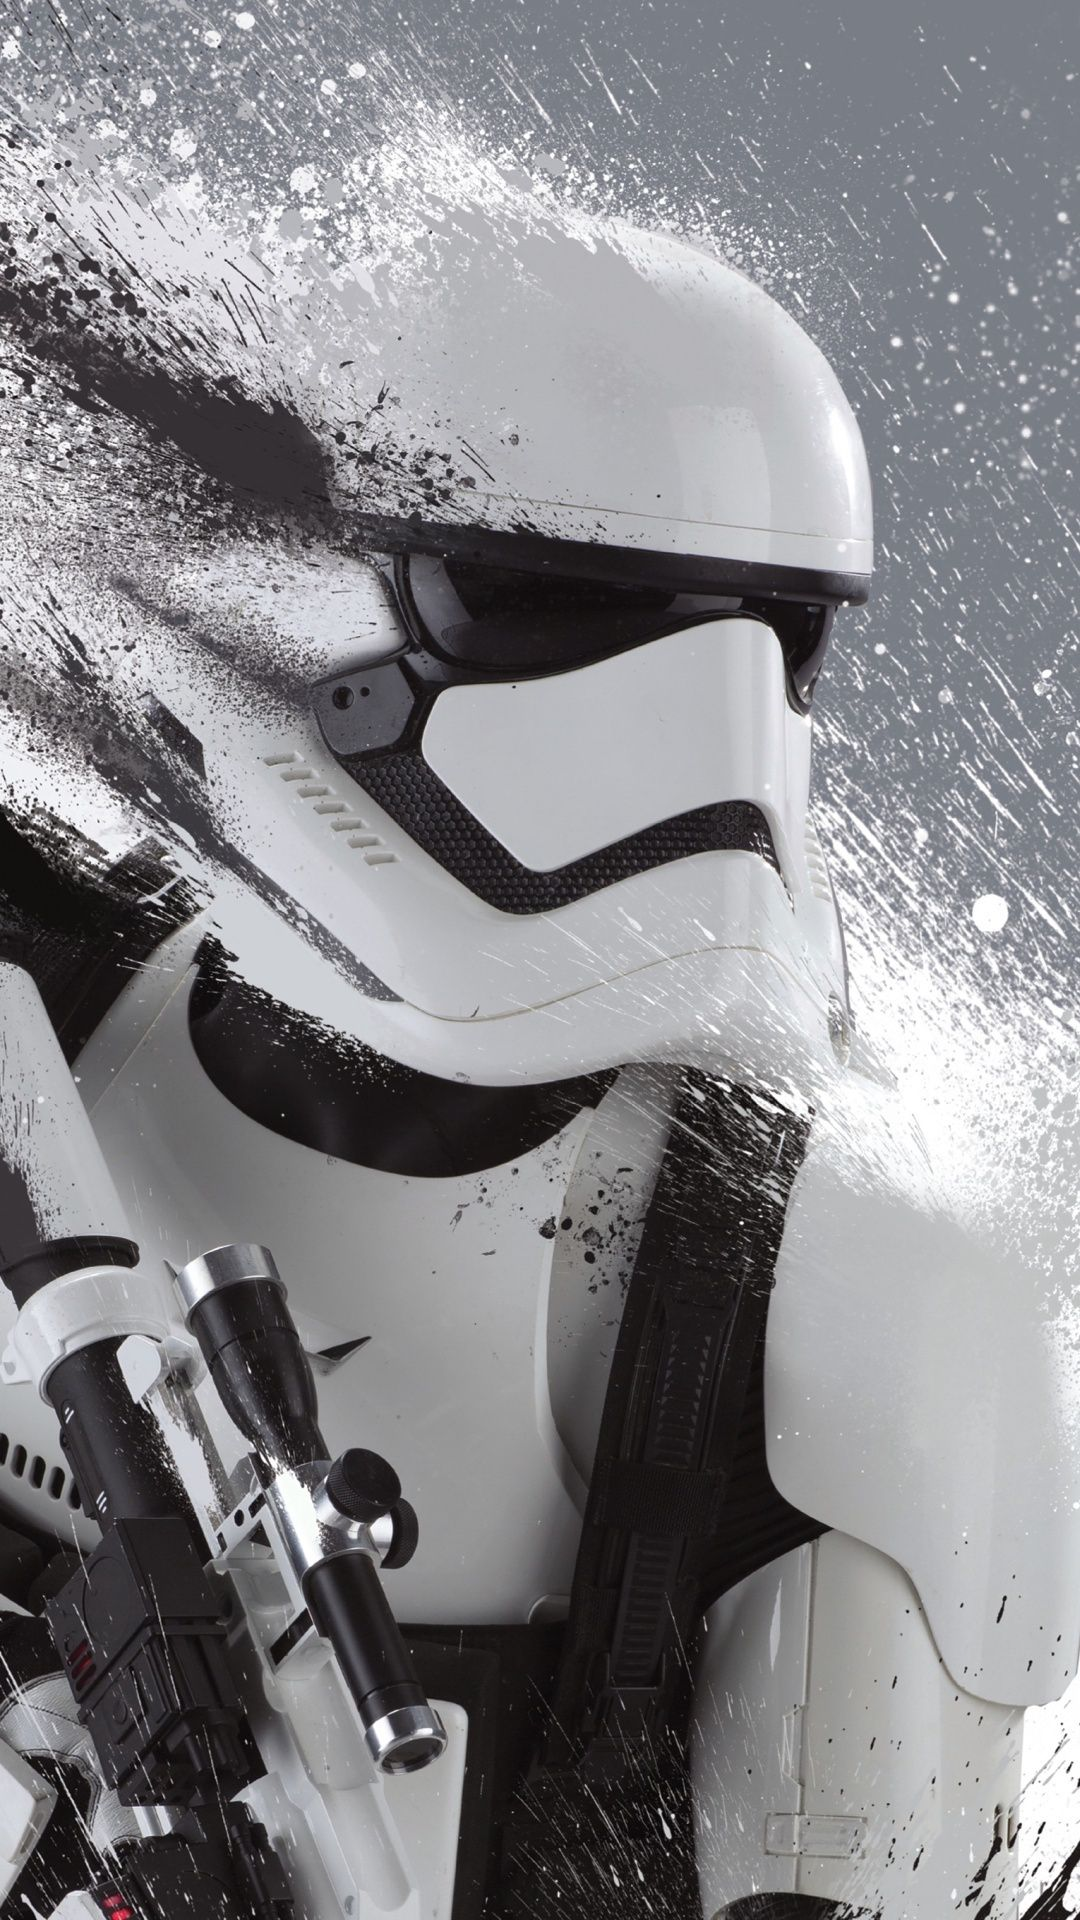 star wars the force awakens wallpaper • stormtrooper blast